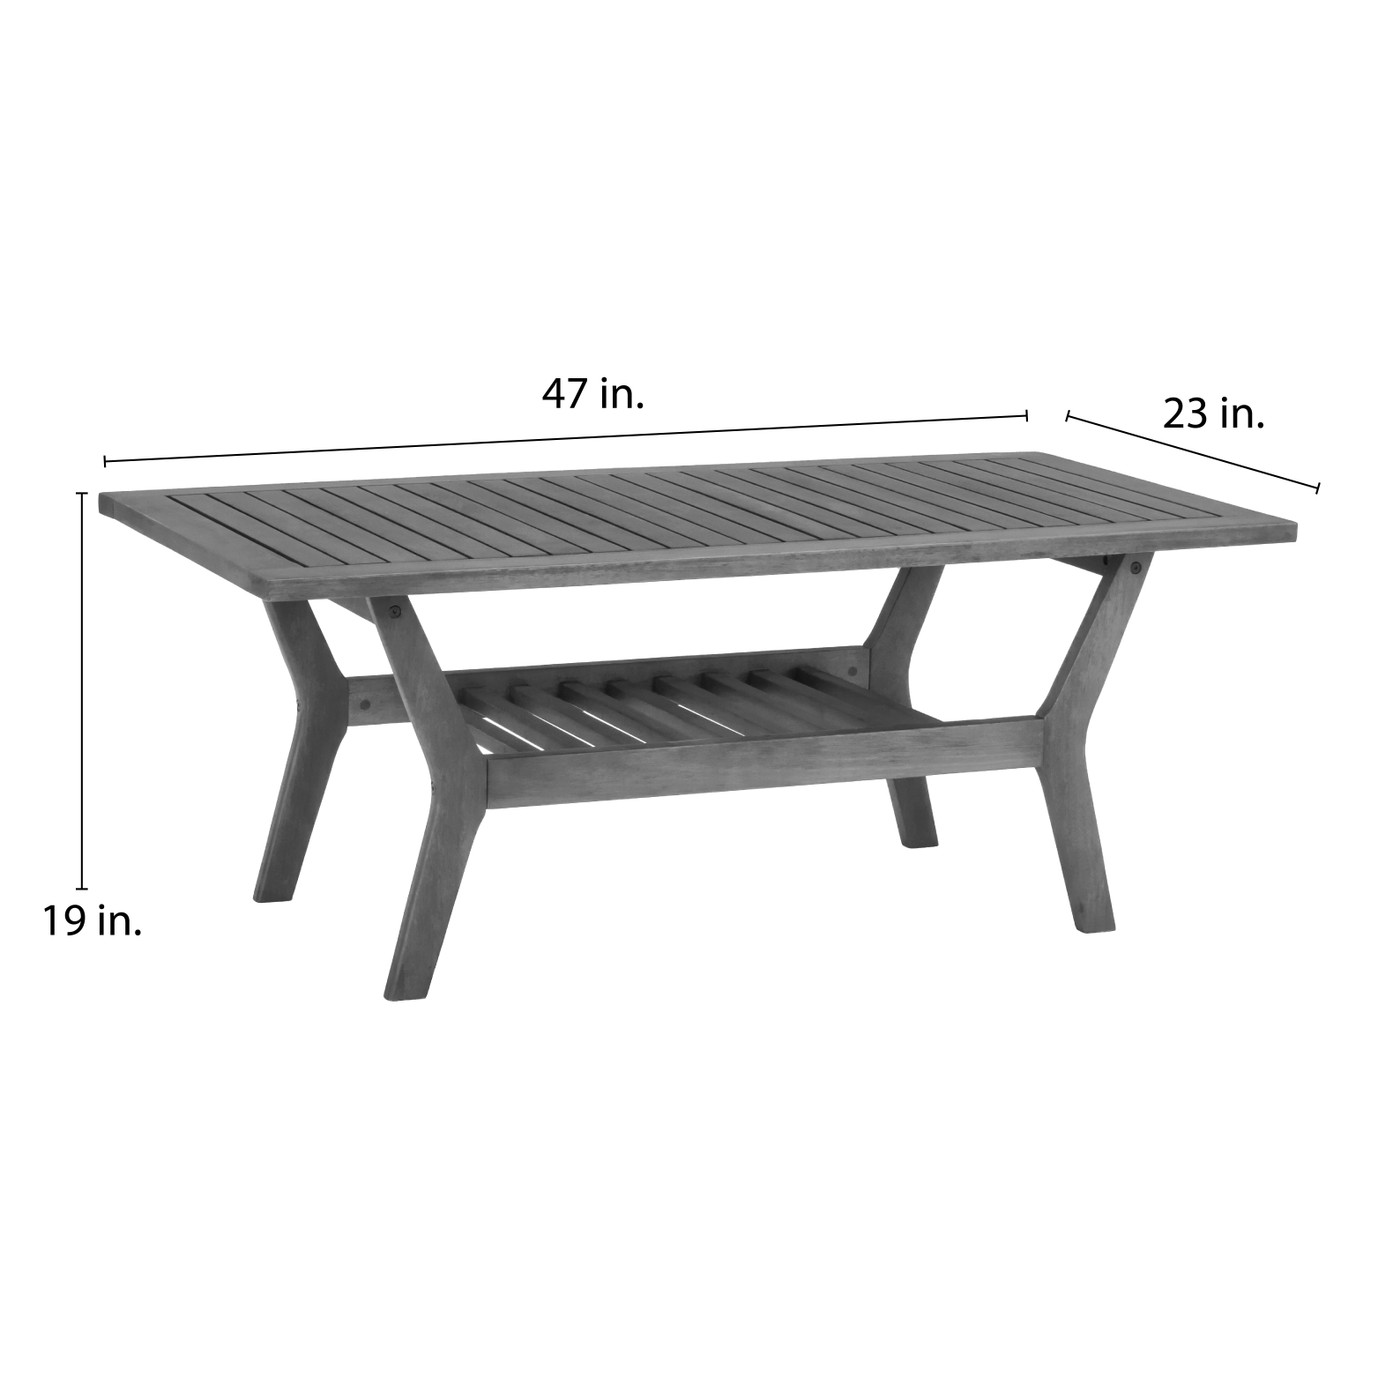 Vaughn 5 Piece Seating Set - Slate Gray